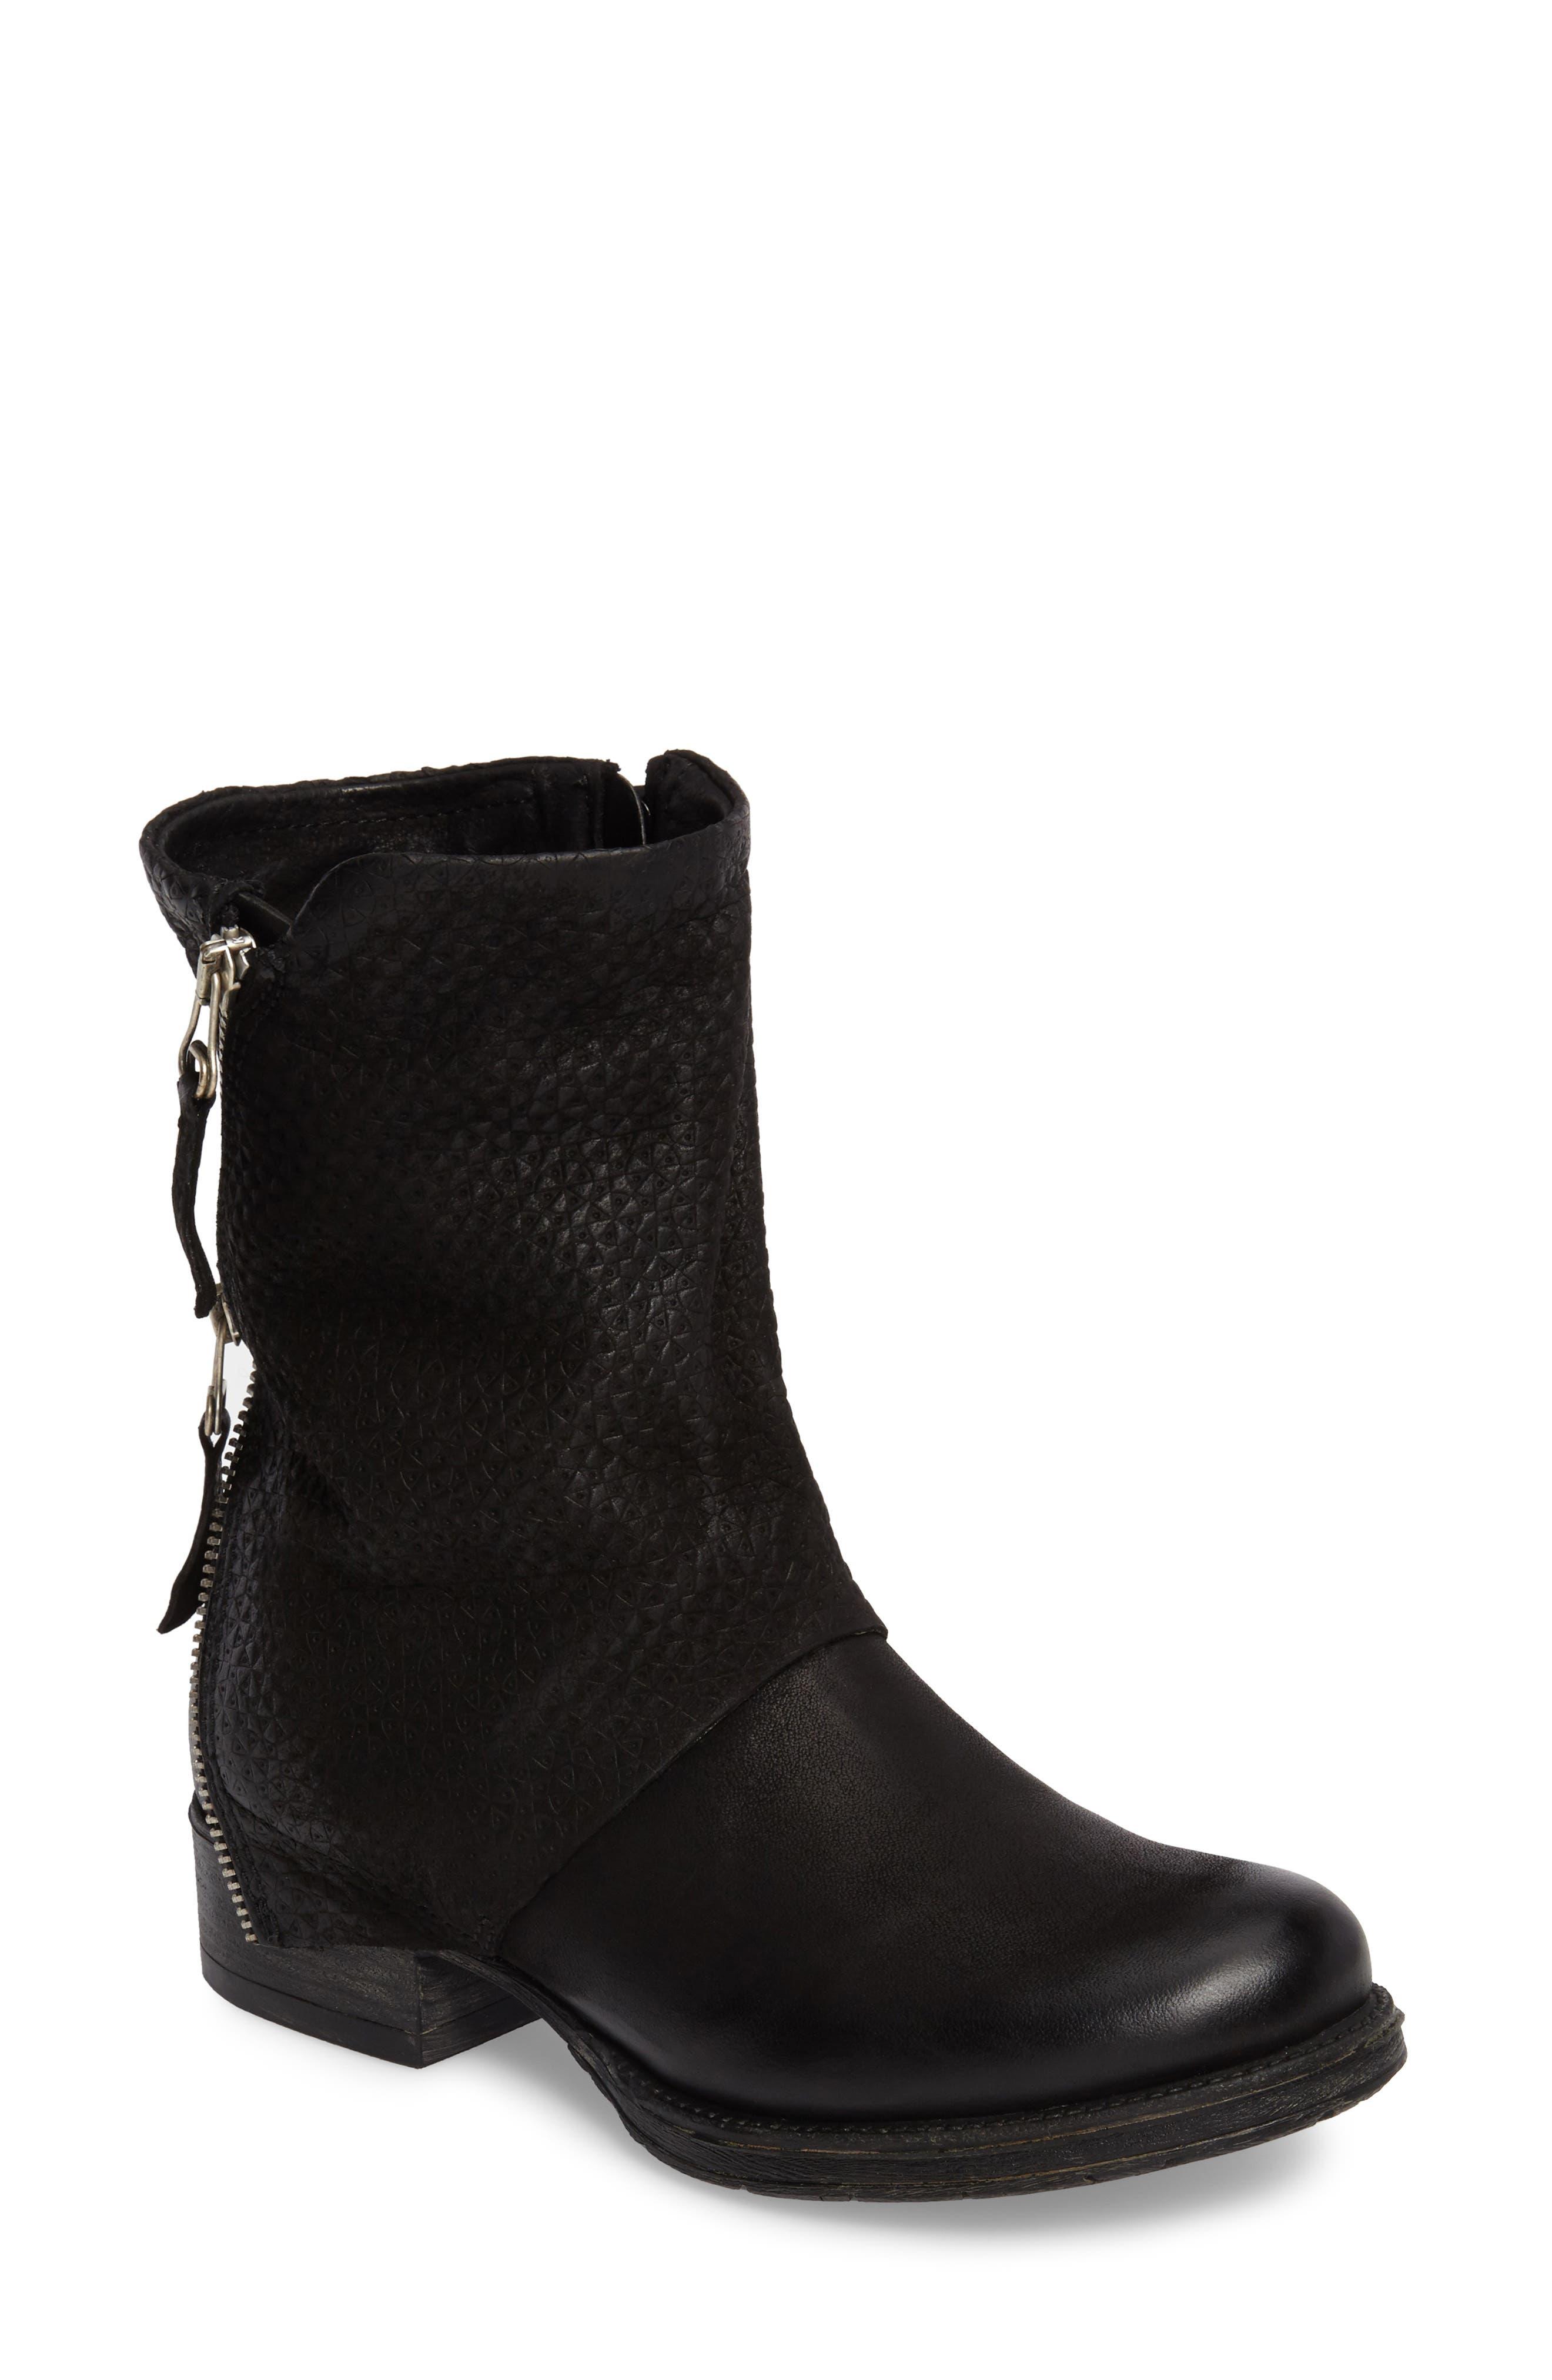 Alternate Image 1 Selected - Miz Mooz Nugget Asymmetrical Textured Boot (Women)